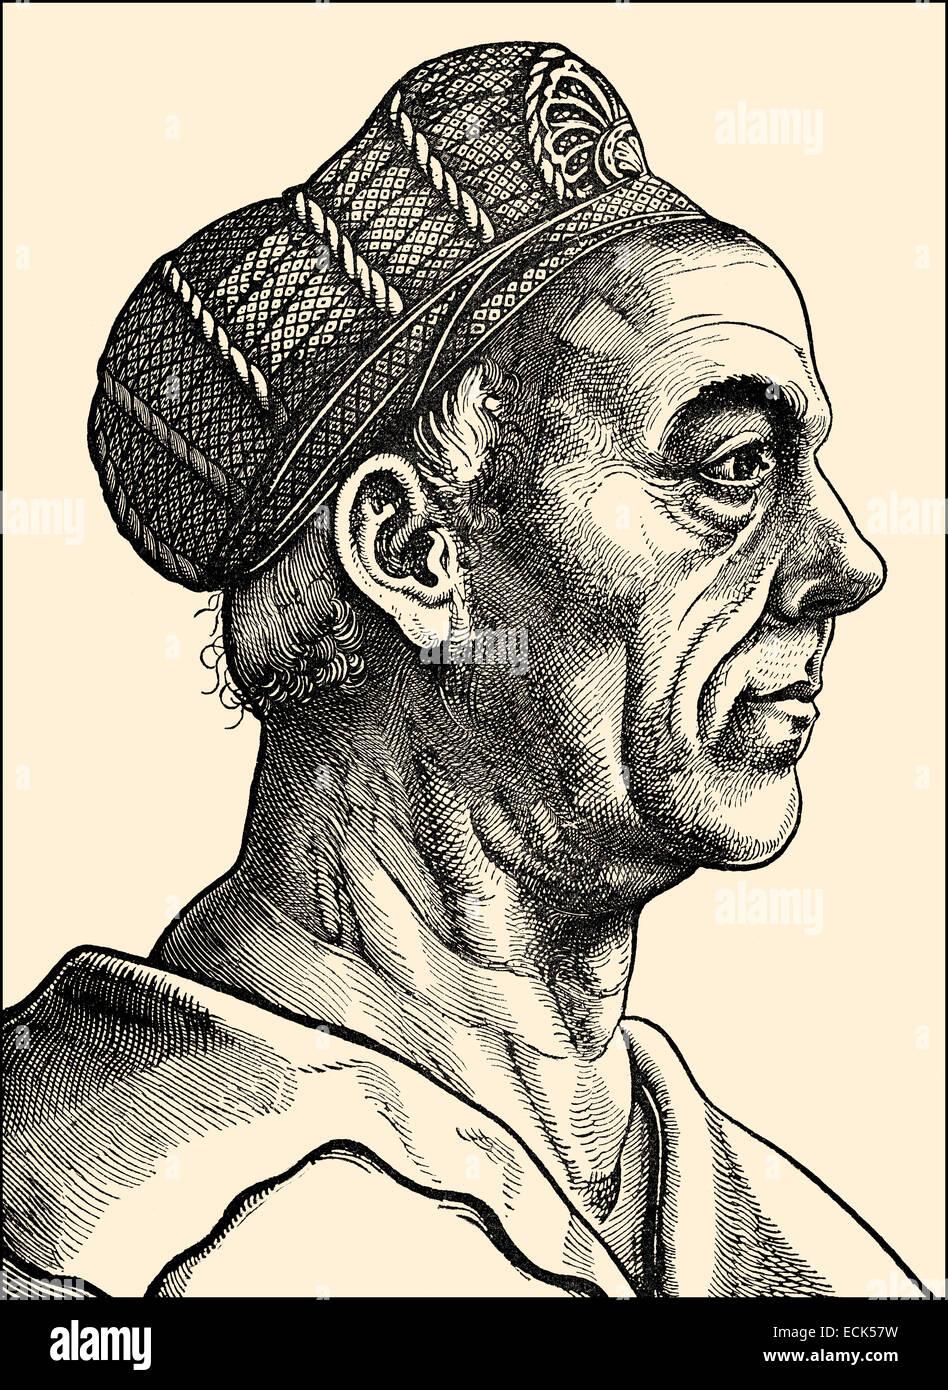 Jakob Fugger, 1459-1525, deutscher Geschäftsmann, Unternehmer und Bankier Jakob Fugger, 1459-1525, Deutscher Stockbild